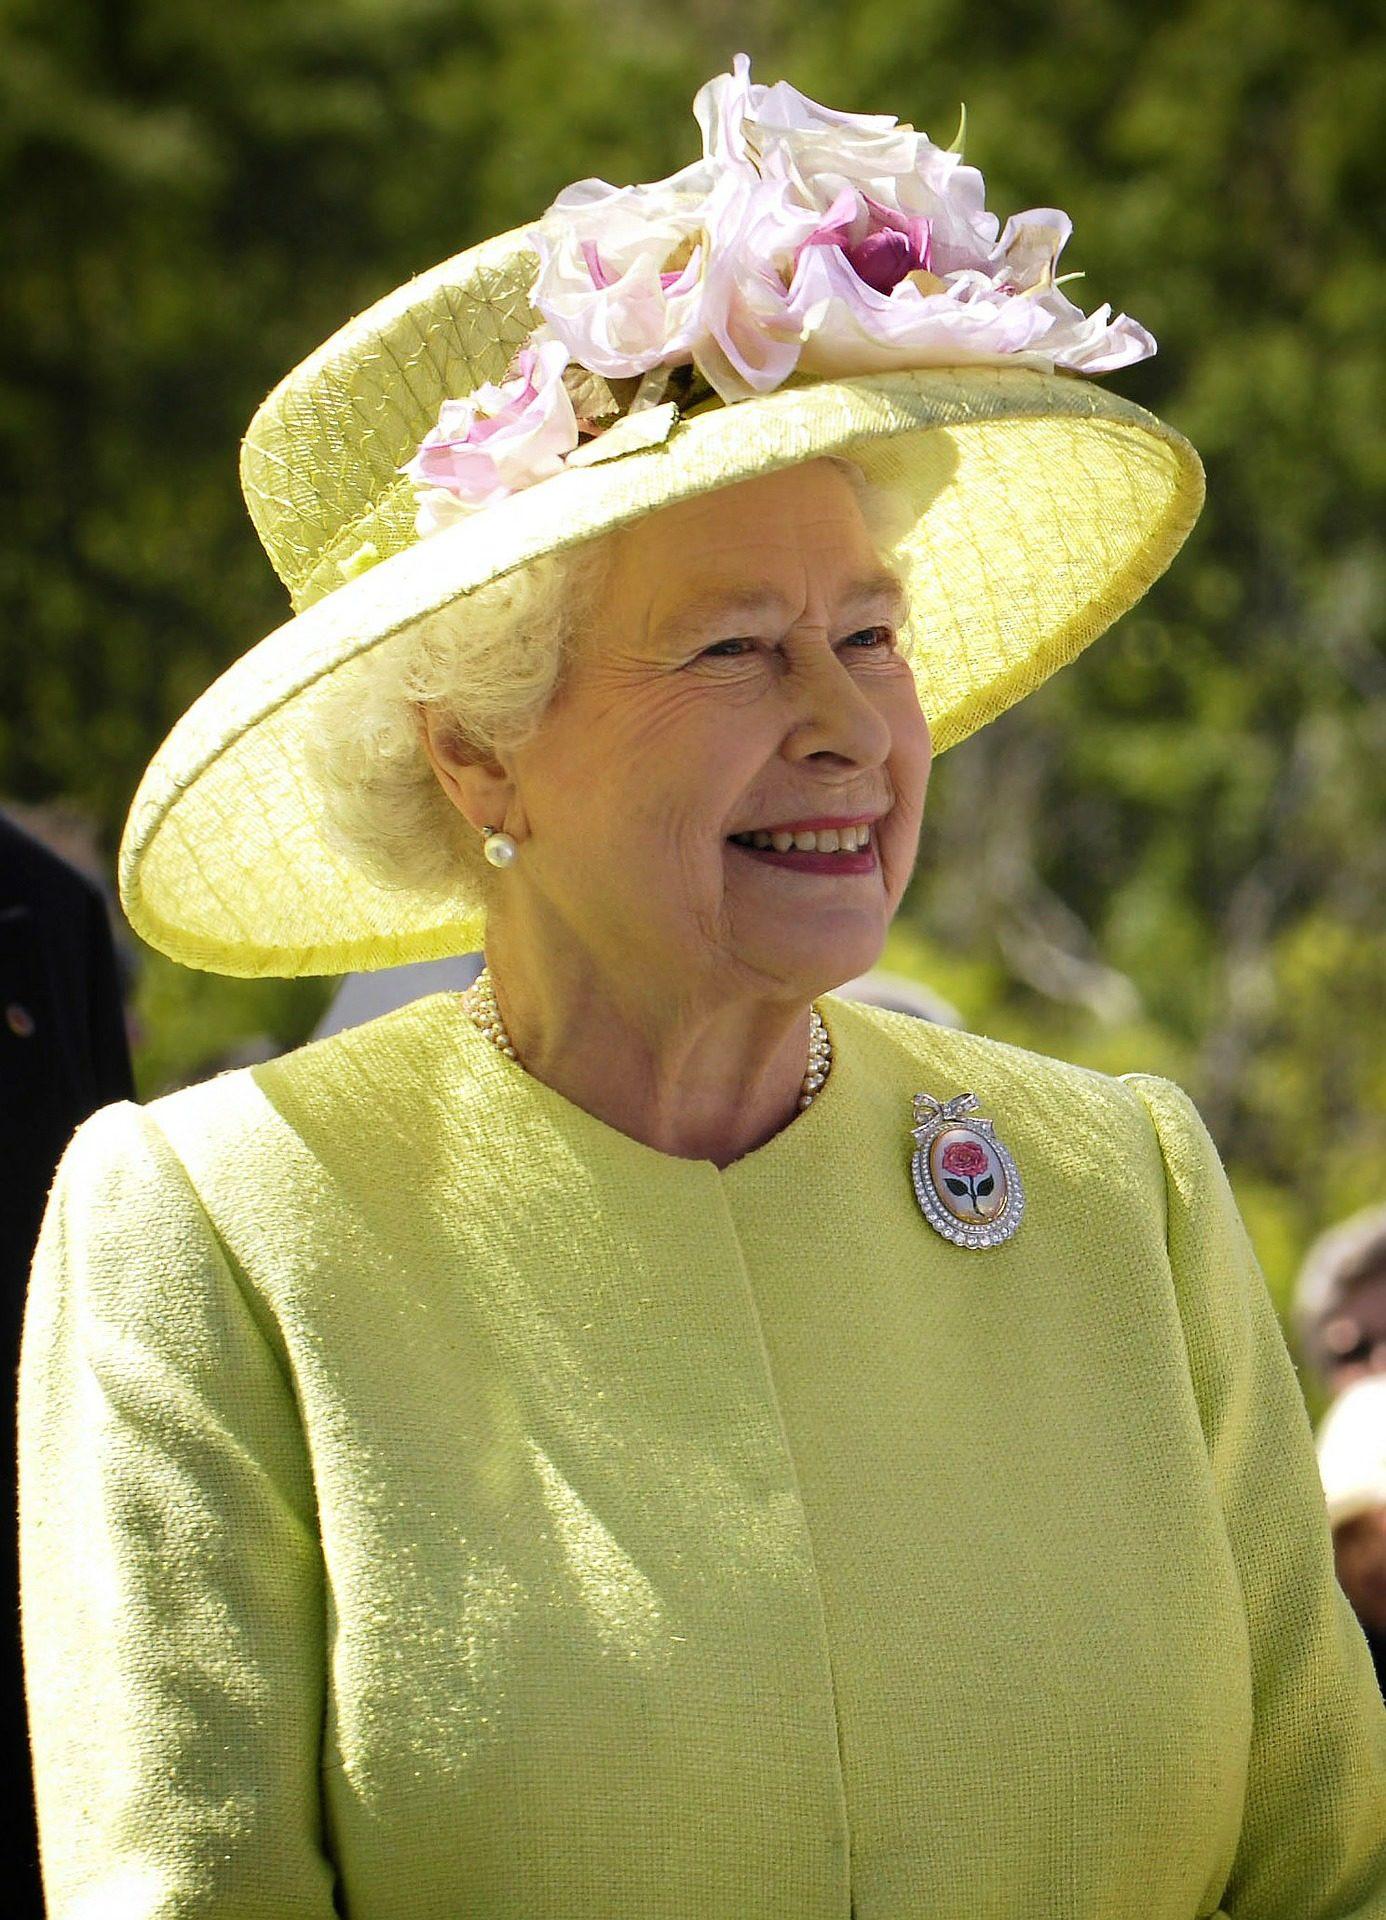 Coronavírus: após 18 anos, rainha Elizabeth II faz pronunciamento histórico